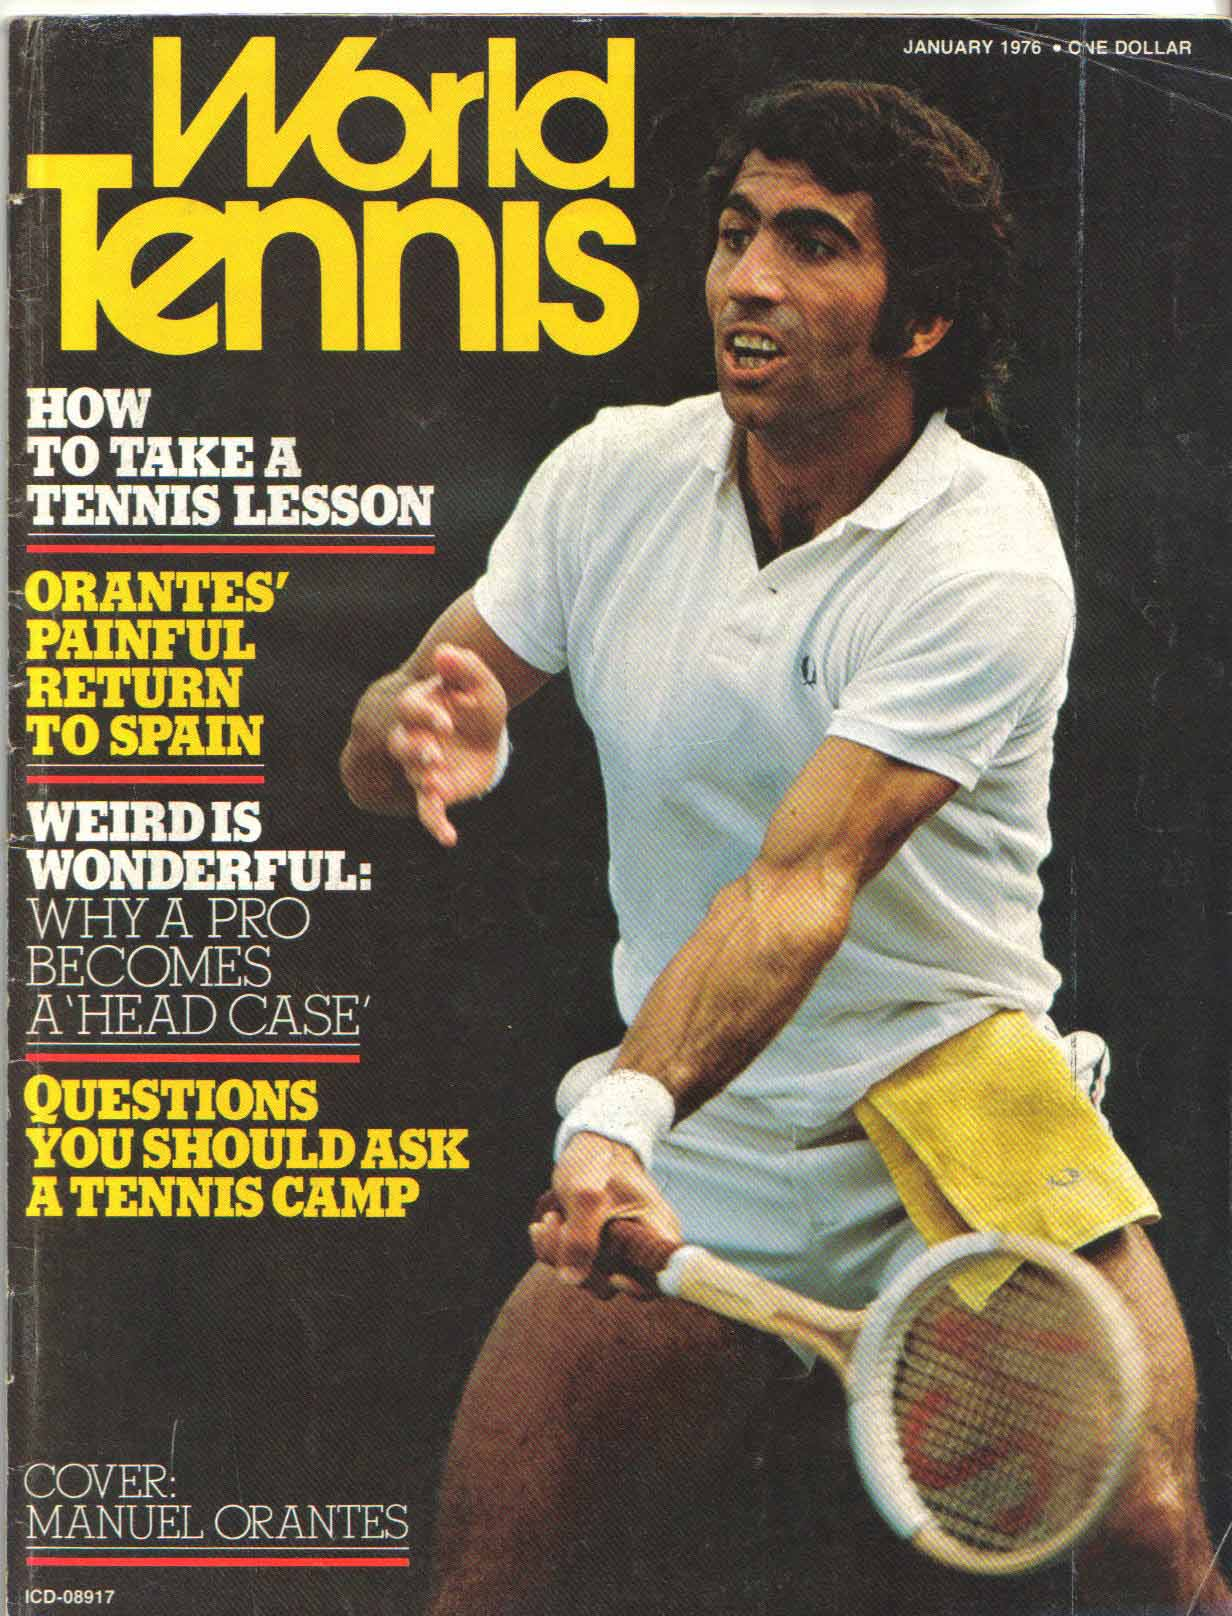 Jim s Tennis 1970s